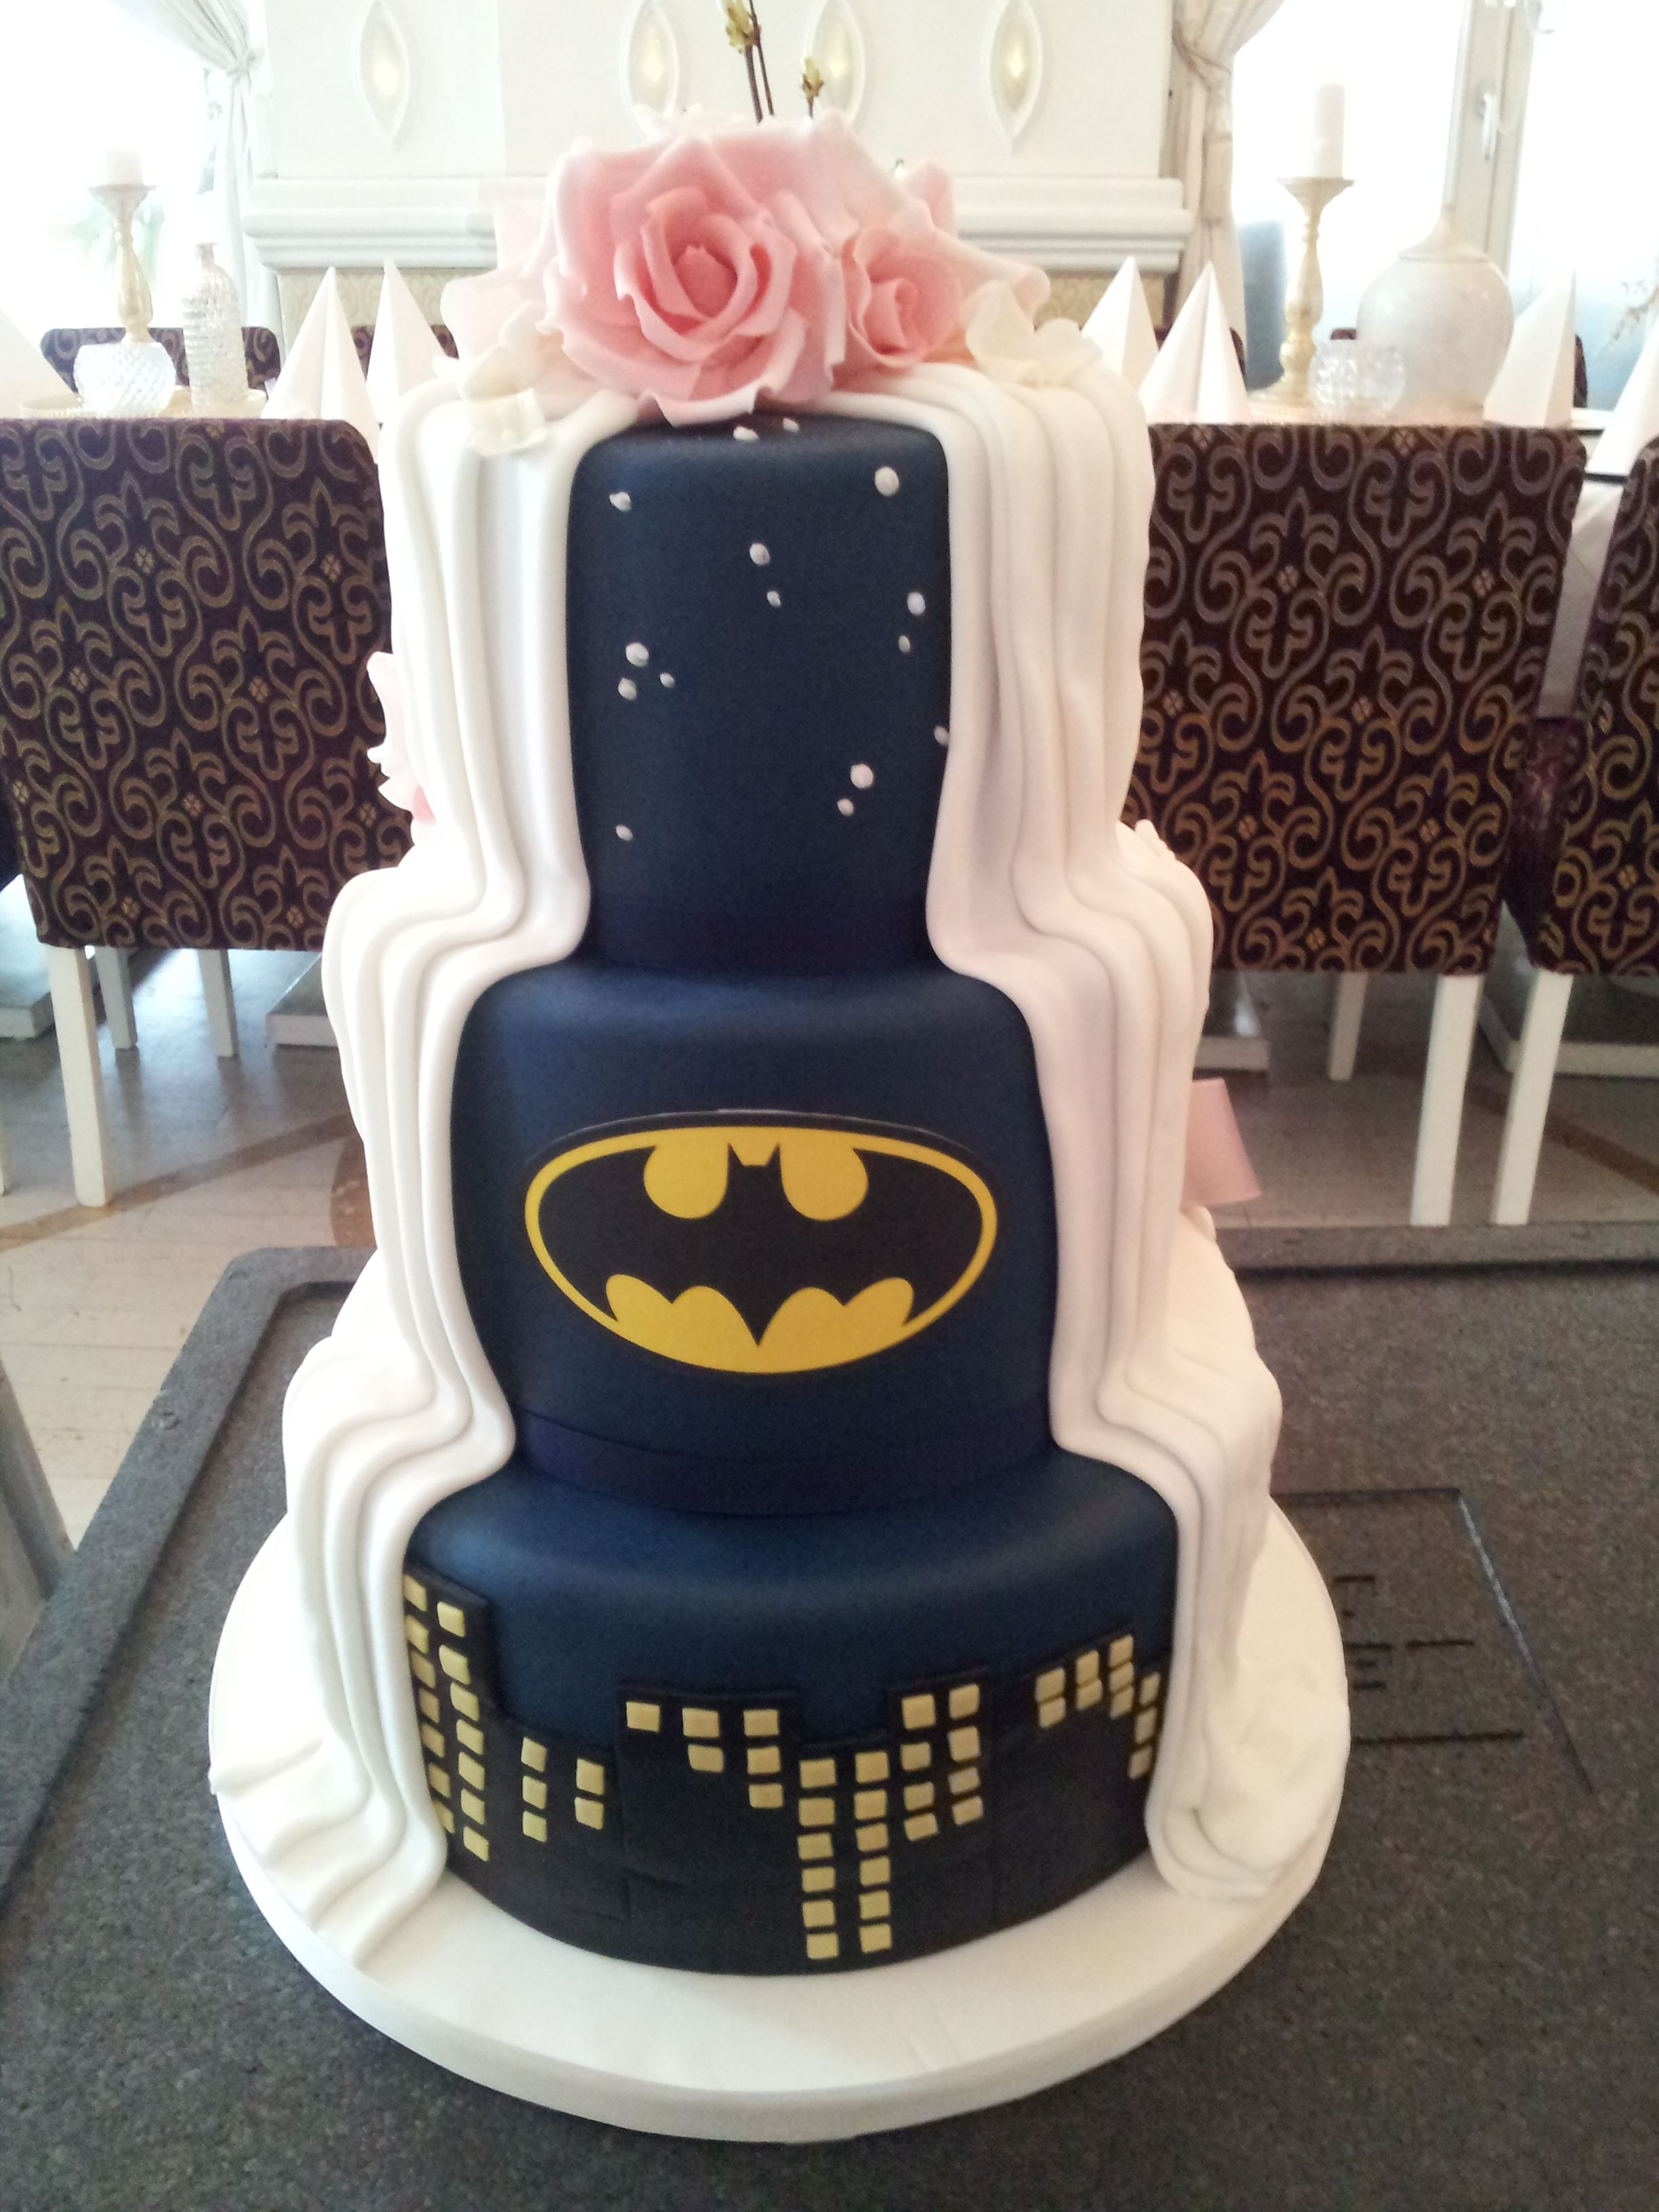 Superhelden Hochzeitstorte Www Thetinycakeboutique Com Torten